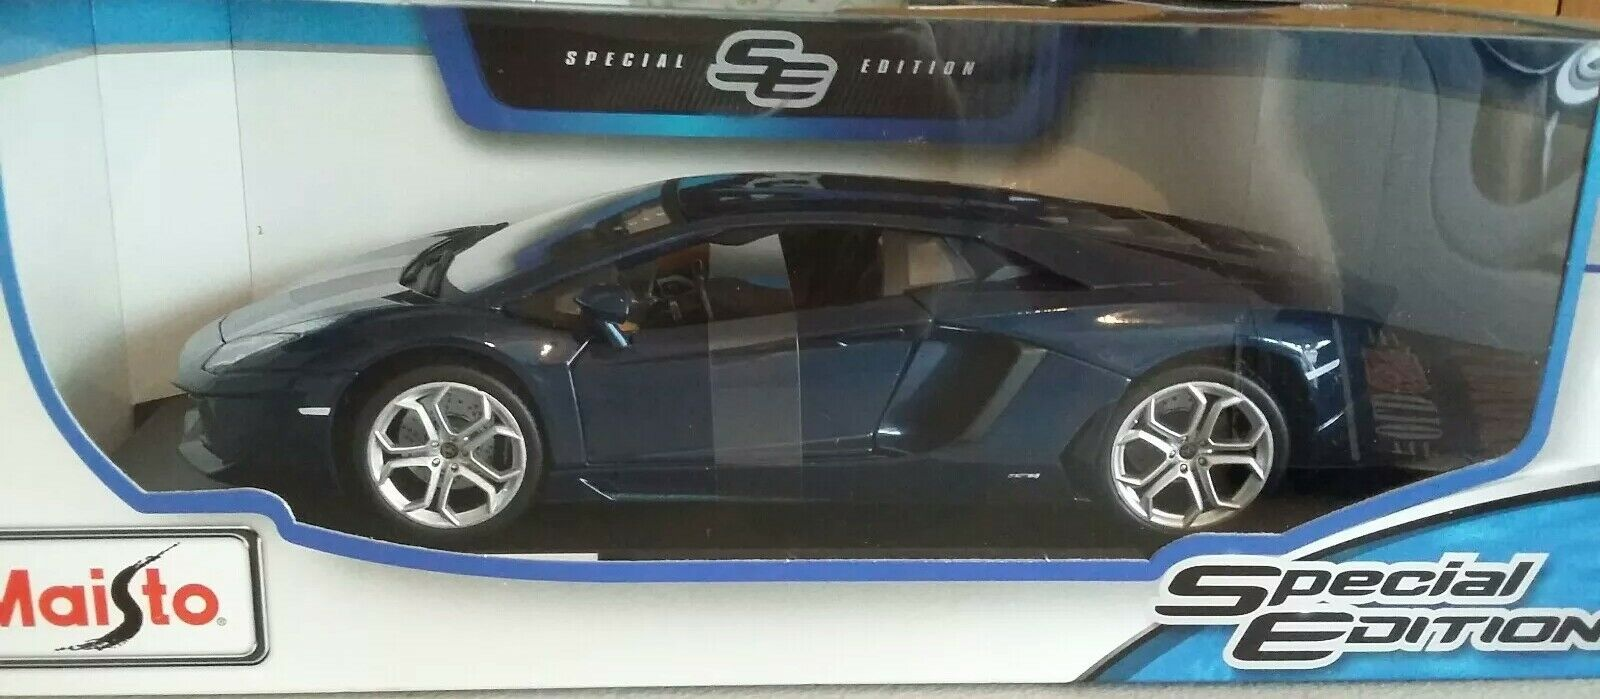 Maisto 1 18 LAMBORGHINI AVENTADOR COUPE bluee Special Edition die Cast Model Car